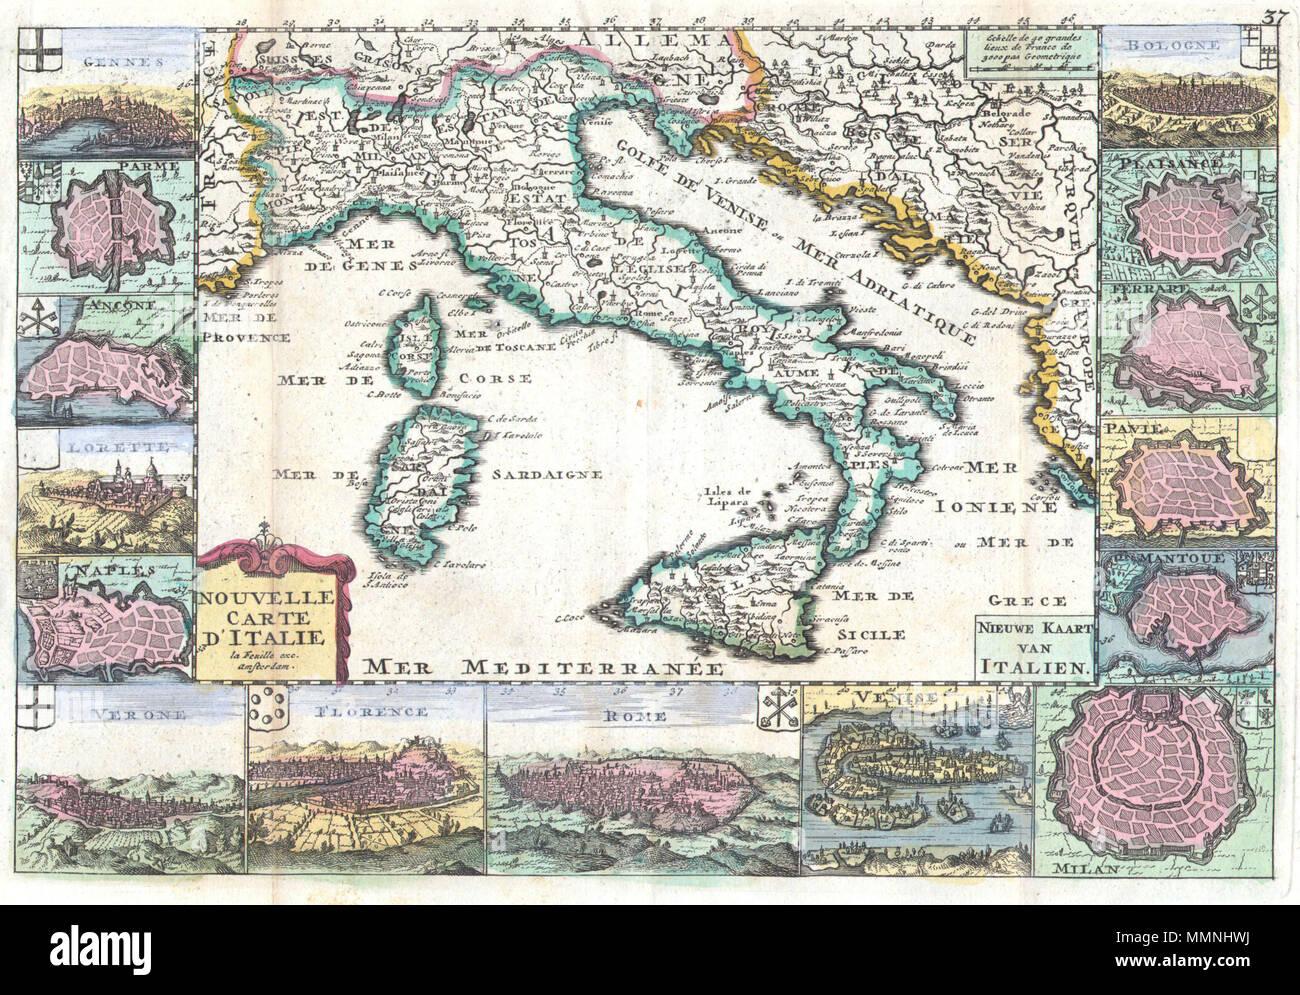 daniele de angelis pesaro italy map - photo#13